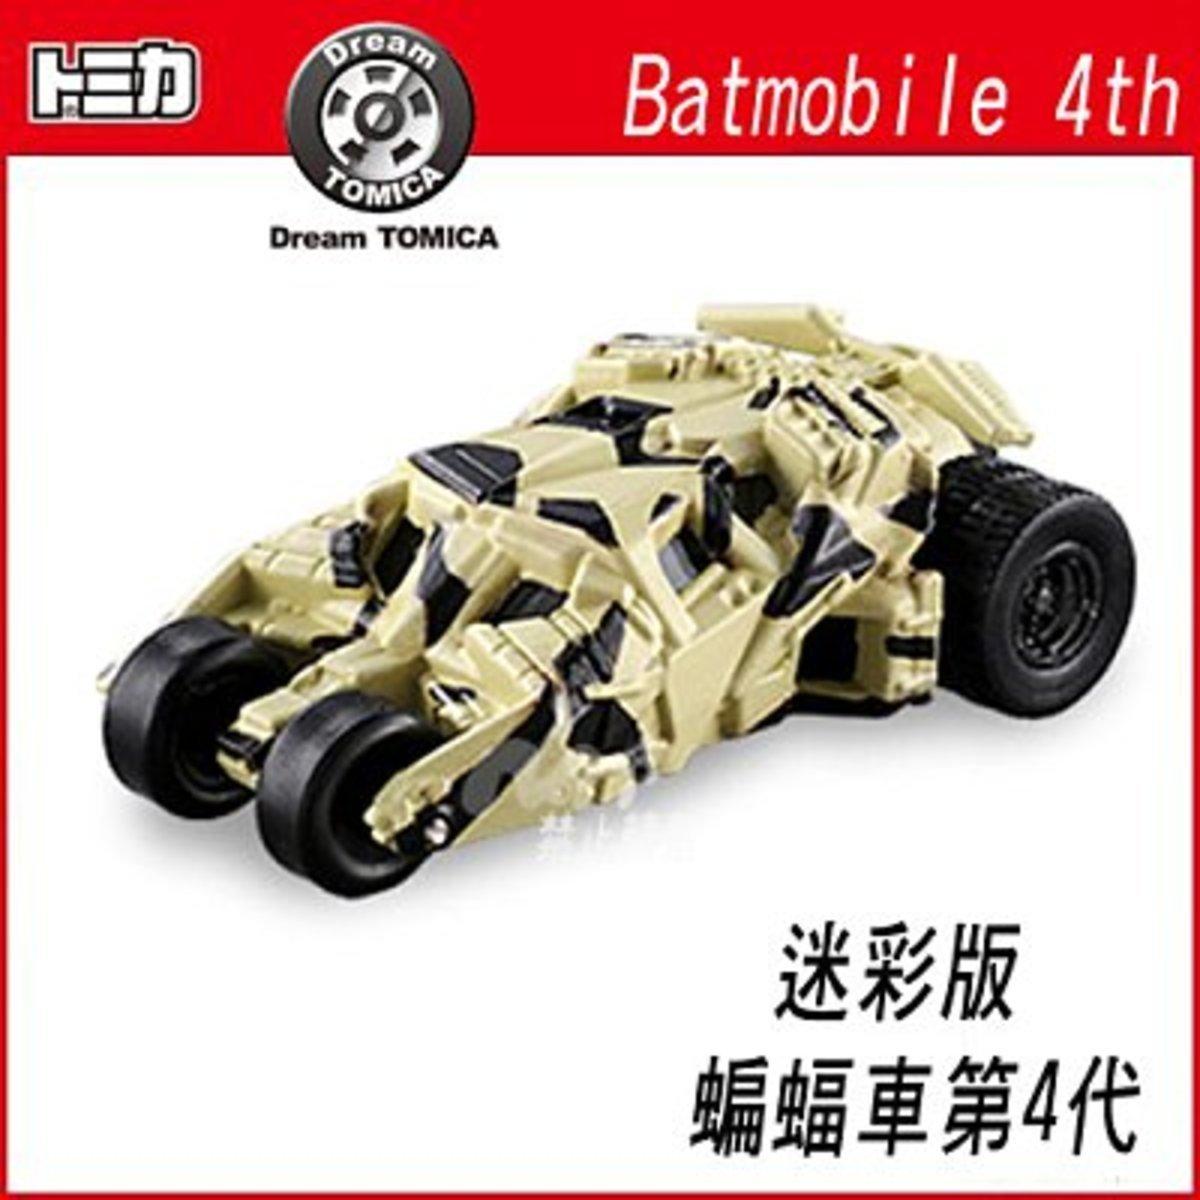 Dream Tomica 迷彩版 裝甲 第4代蝙蝠車